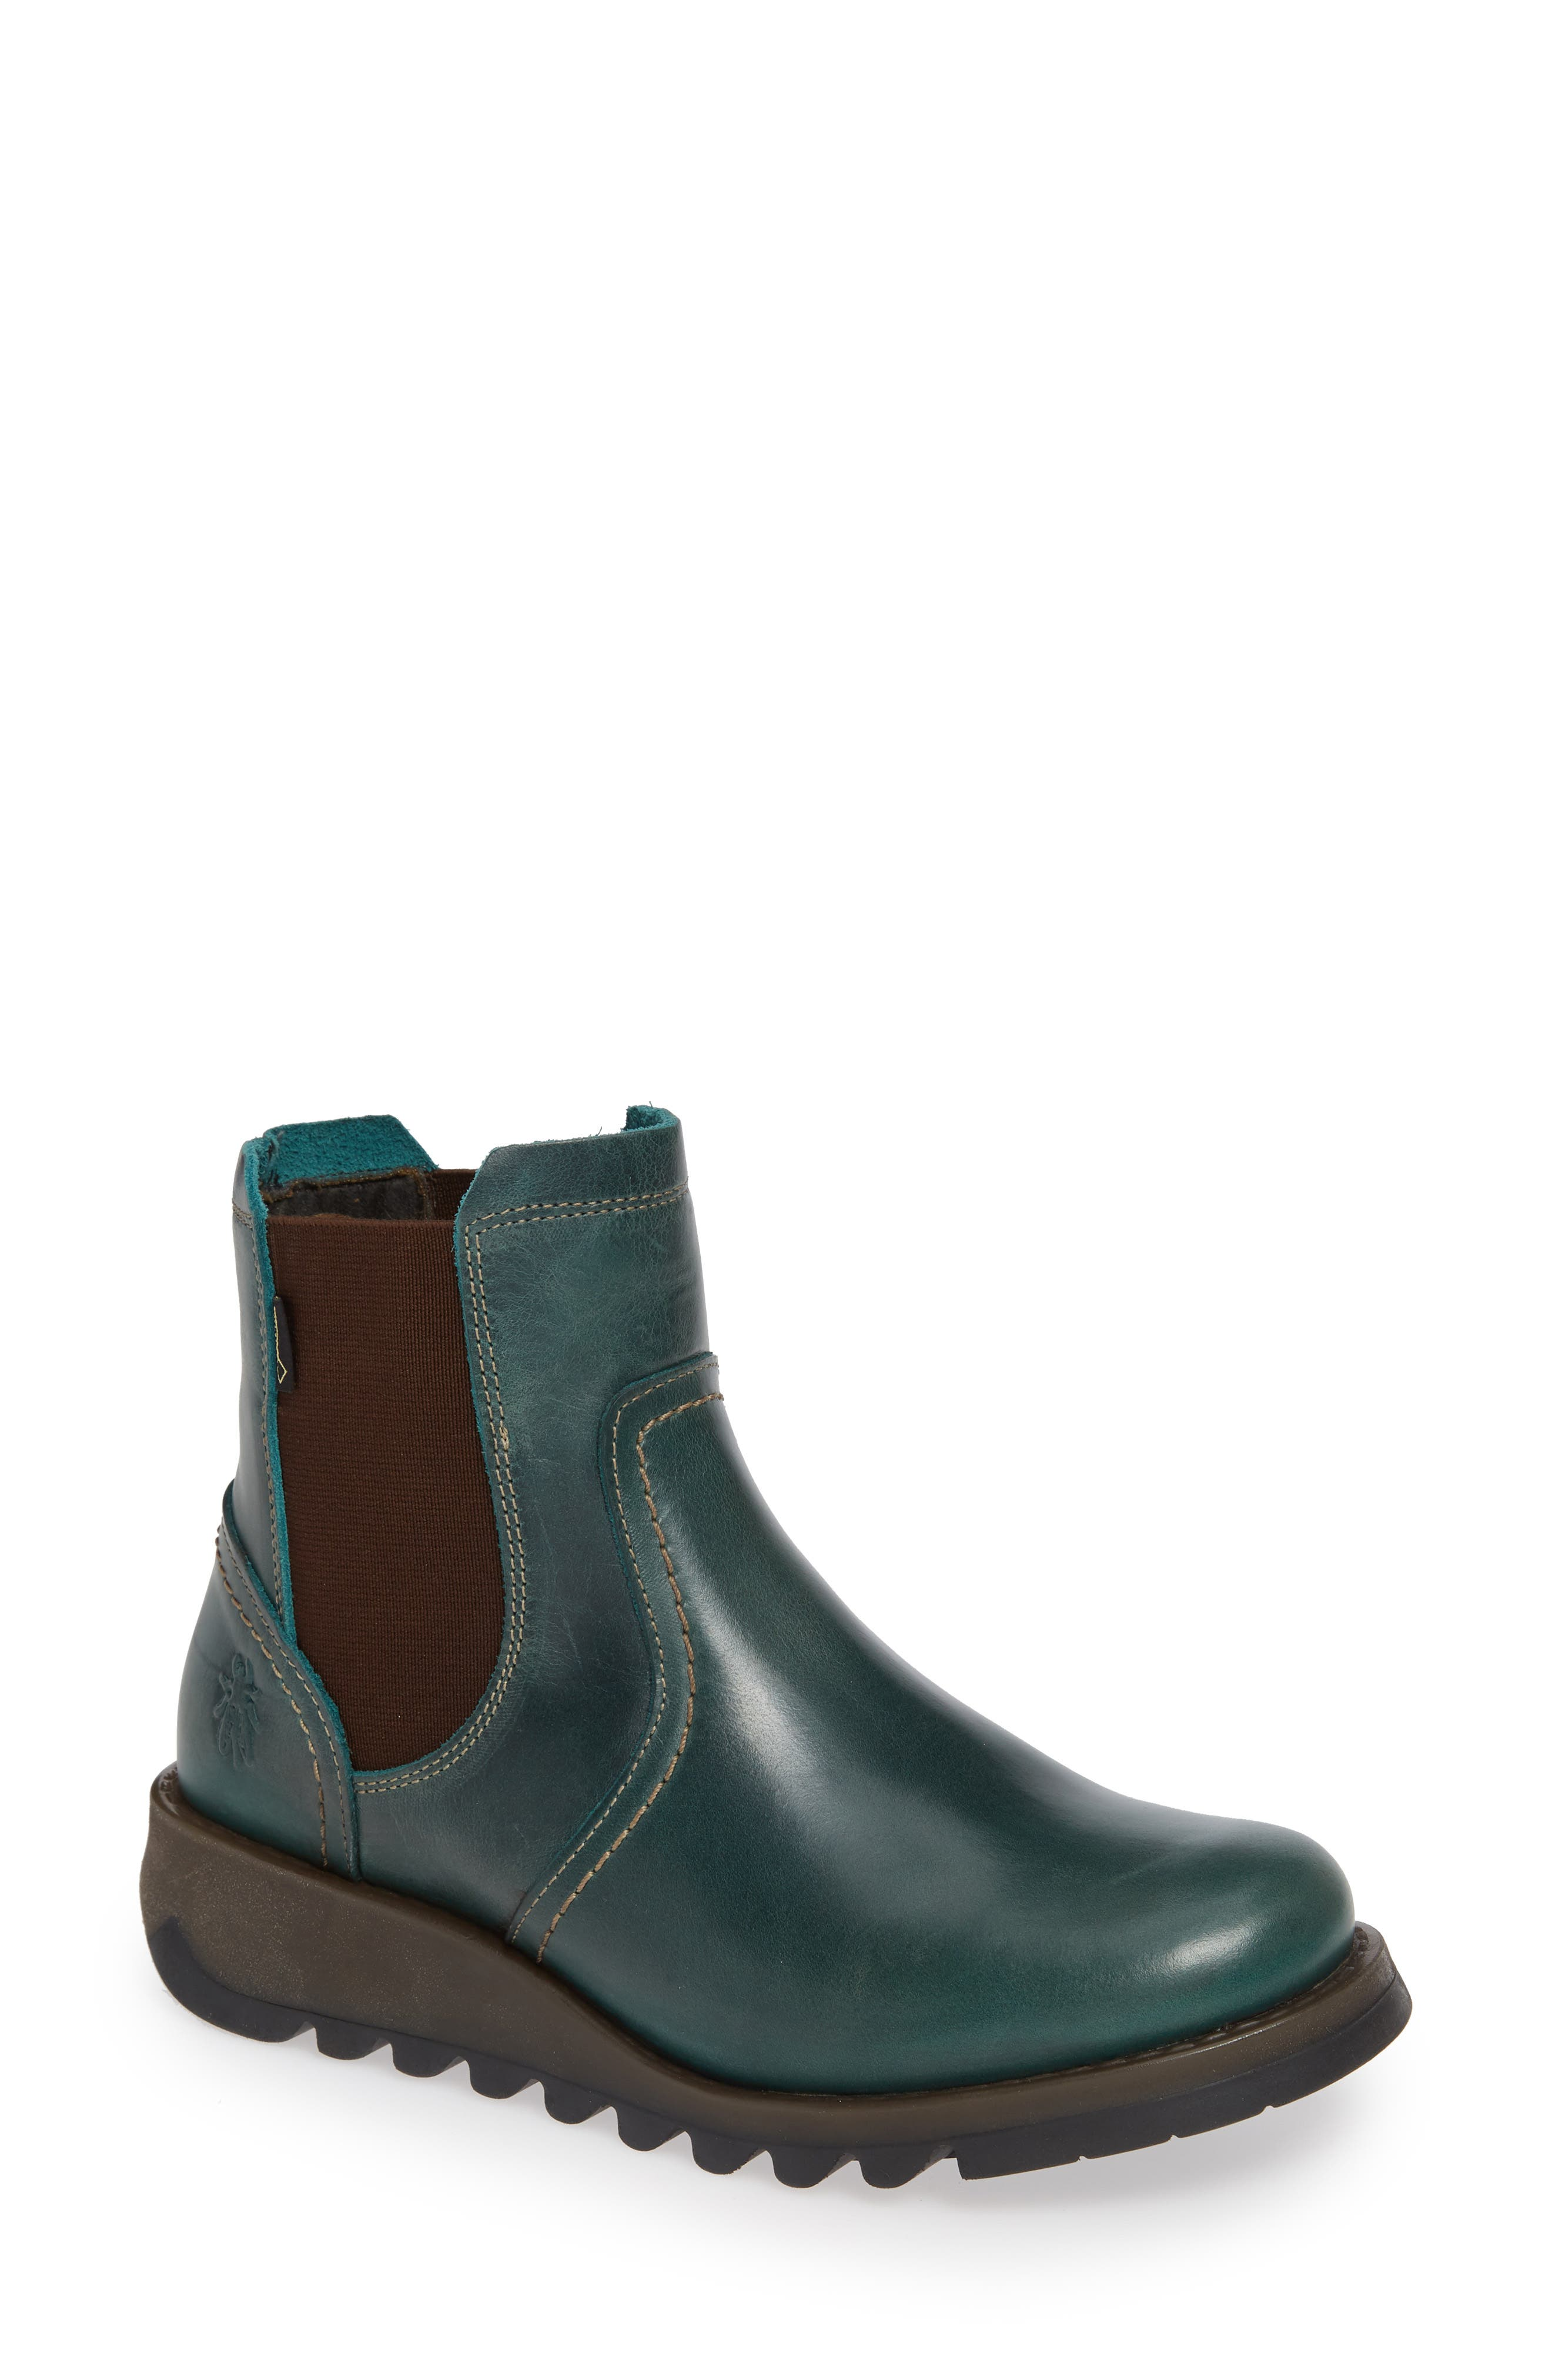 Scon Waterproof Gore-Tex<sup>®</sup> Chelsea Boot,                             Main thumbnail 1, color,                             PETROL